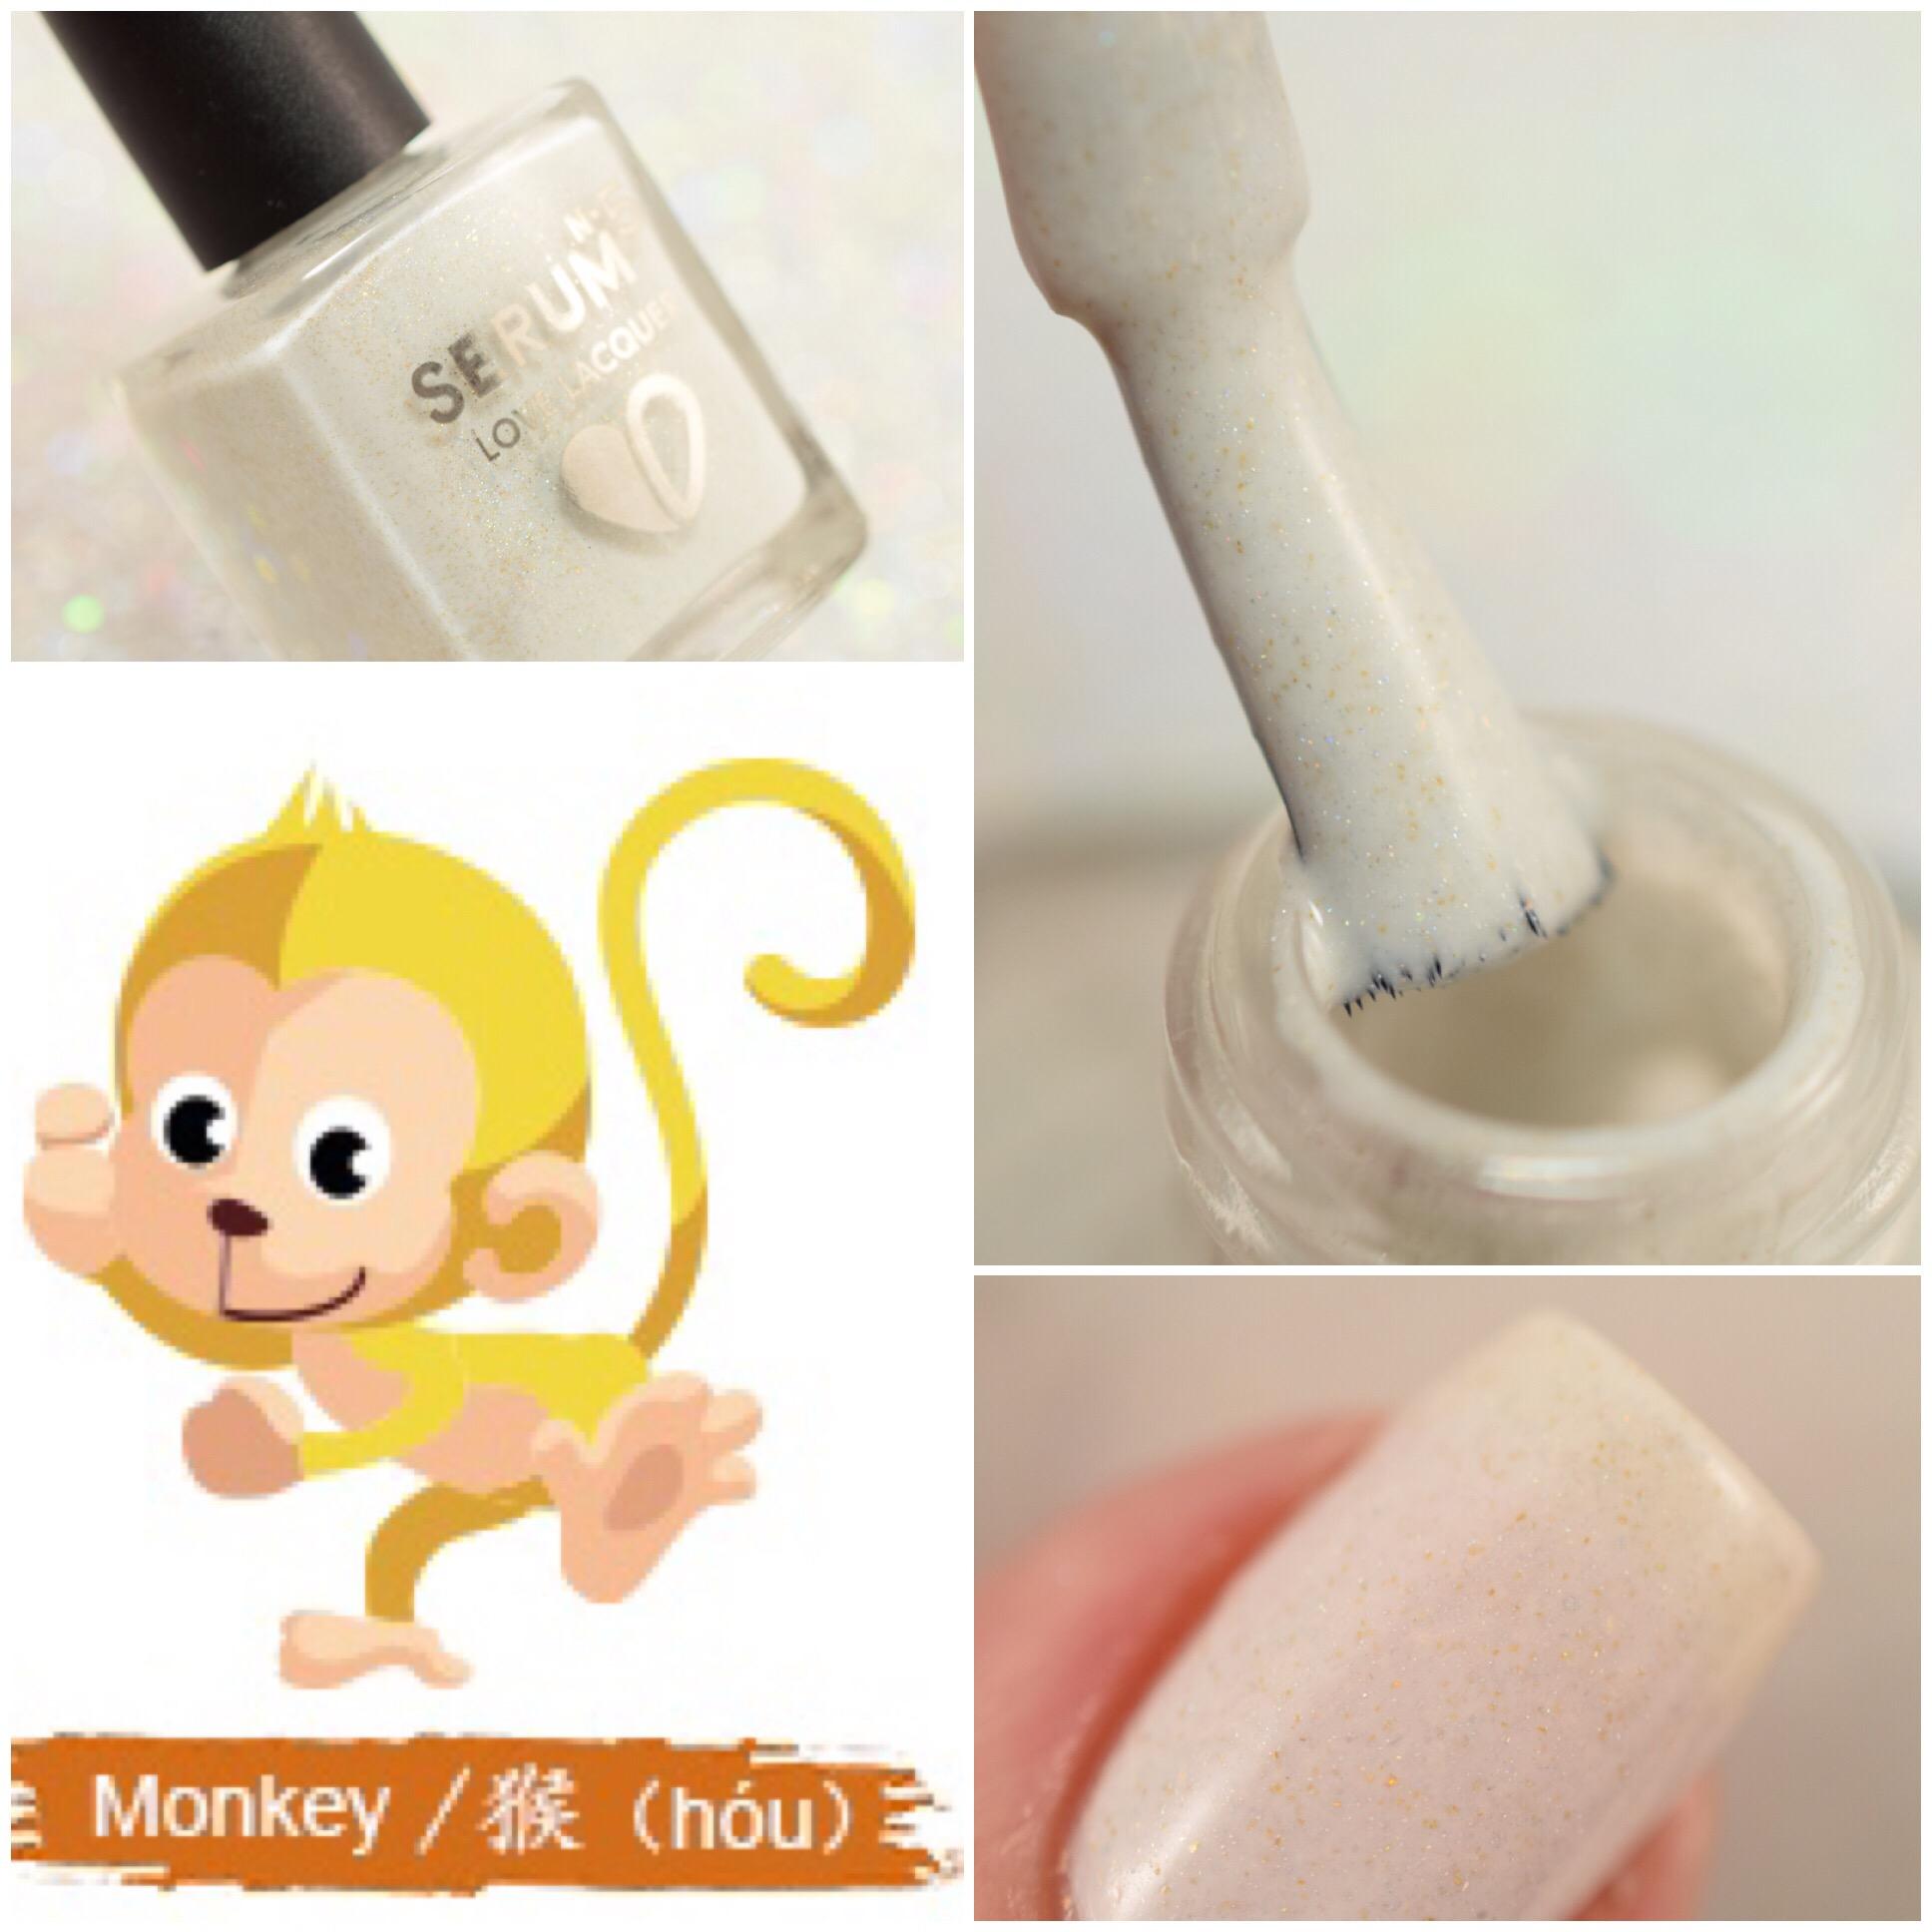 Serum No5 Monkey